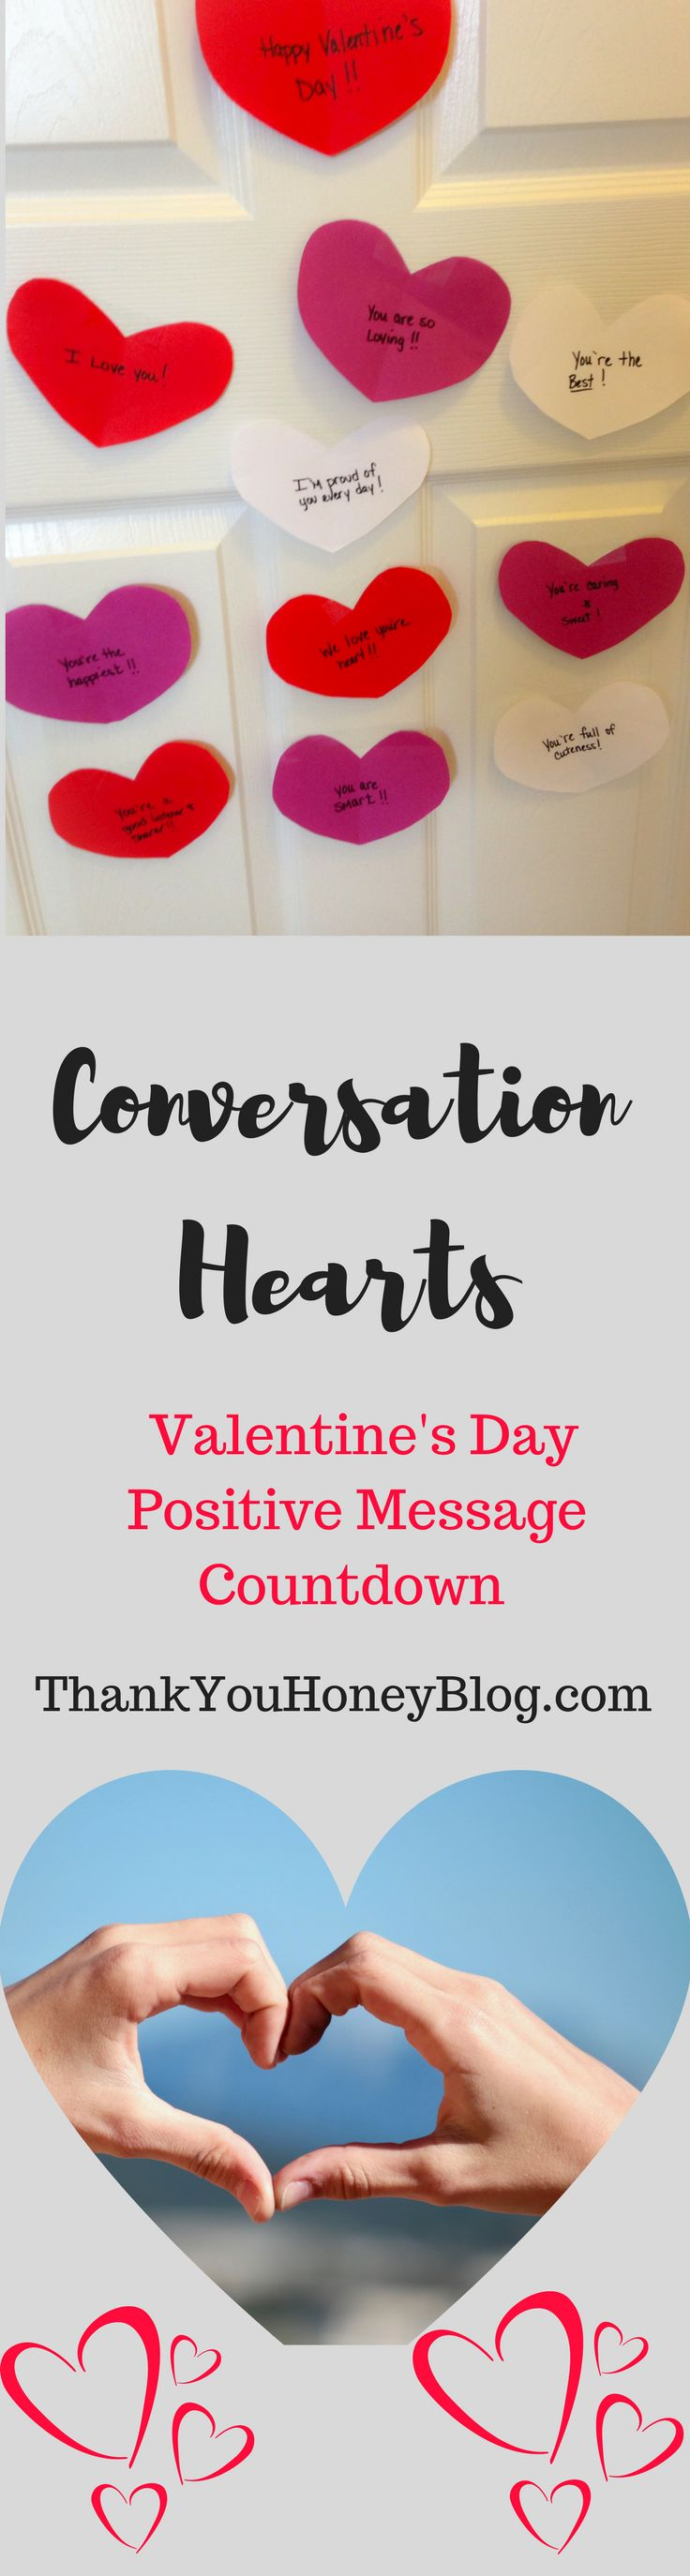 #ConversationHearts, #PositiveParenting, Hearts, #Messages, Positive Messages, Count Down, Valentine's Day, #KidsActivity, Conversation Hearts, #ValentinesDay, #Countdown, Kids, Positive Messages, Love